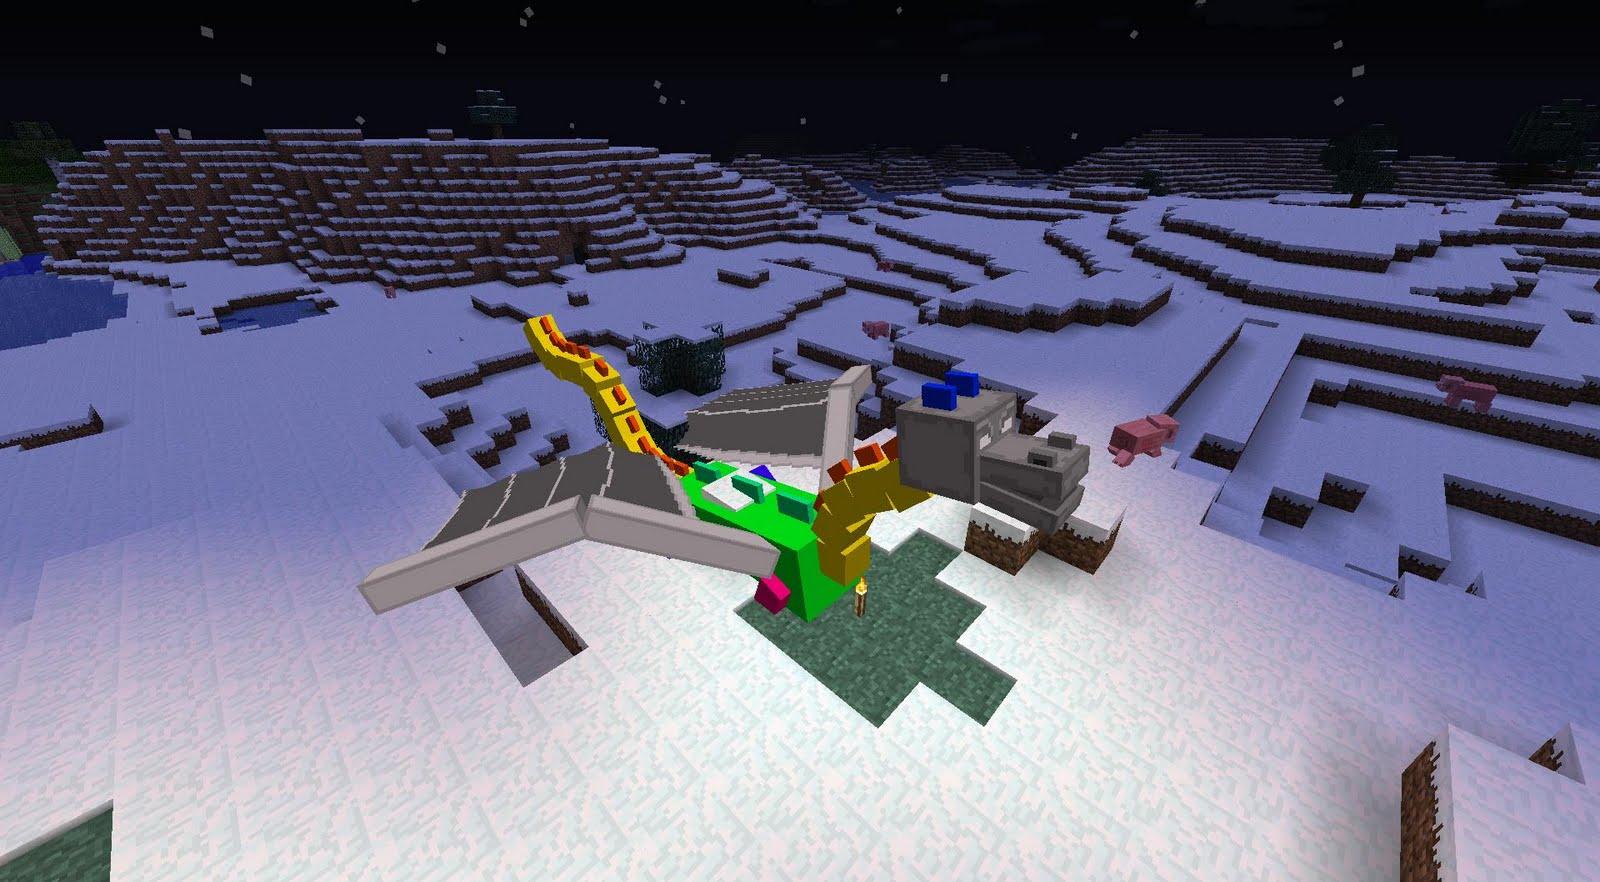 http://1.bp.blogspot.com/-qKtGtu1lrDE/TpMEf-II_0I/AAAAAAAAAeY/koDmMTBPDP4/s1600/minecraft-drago-02.jpg